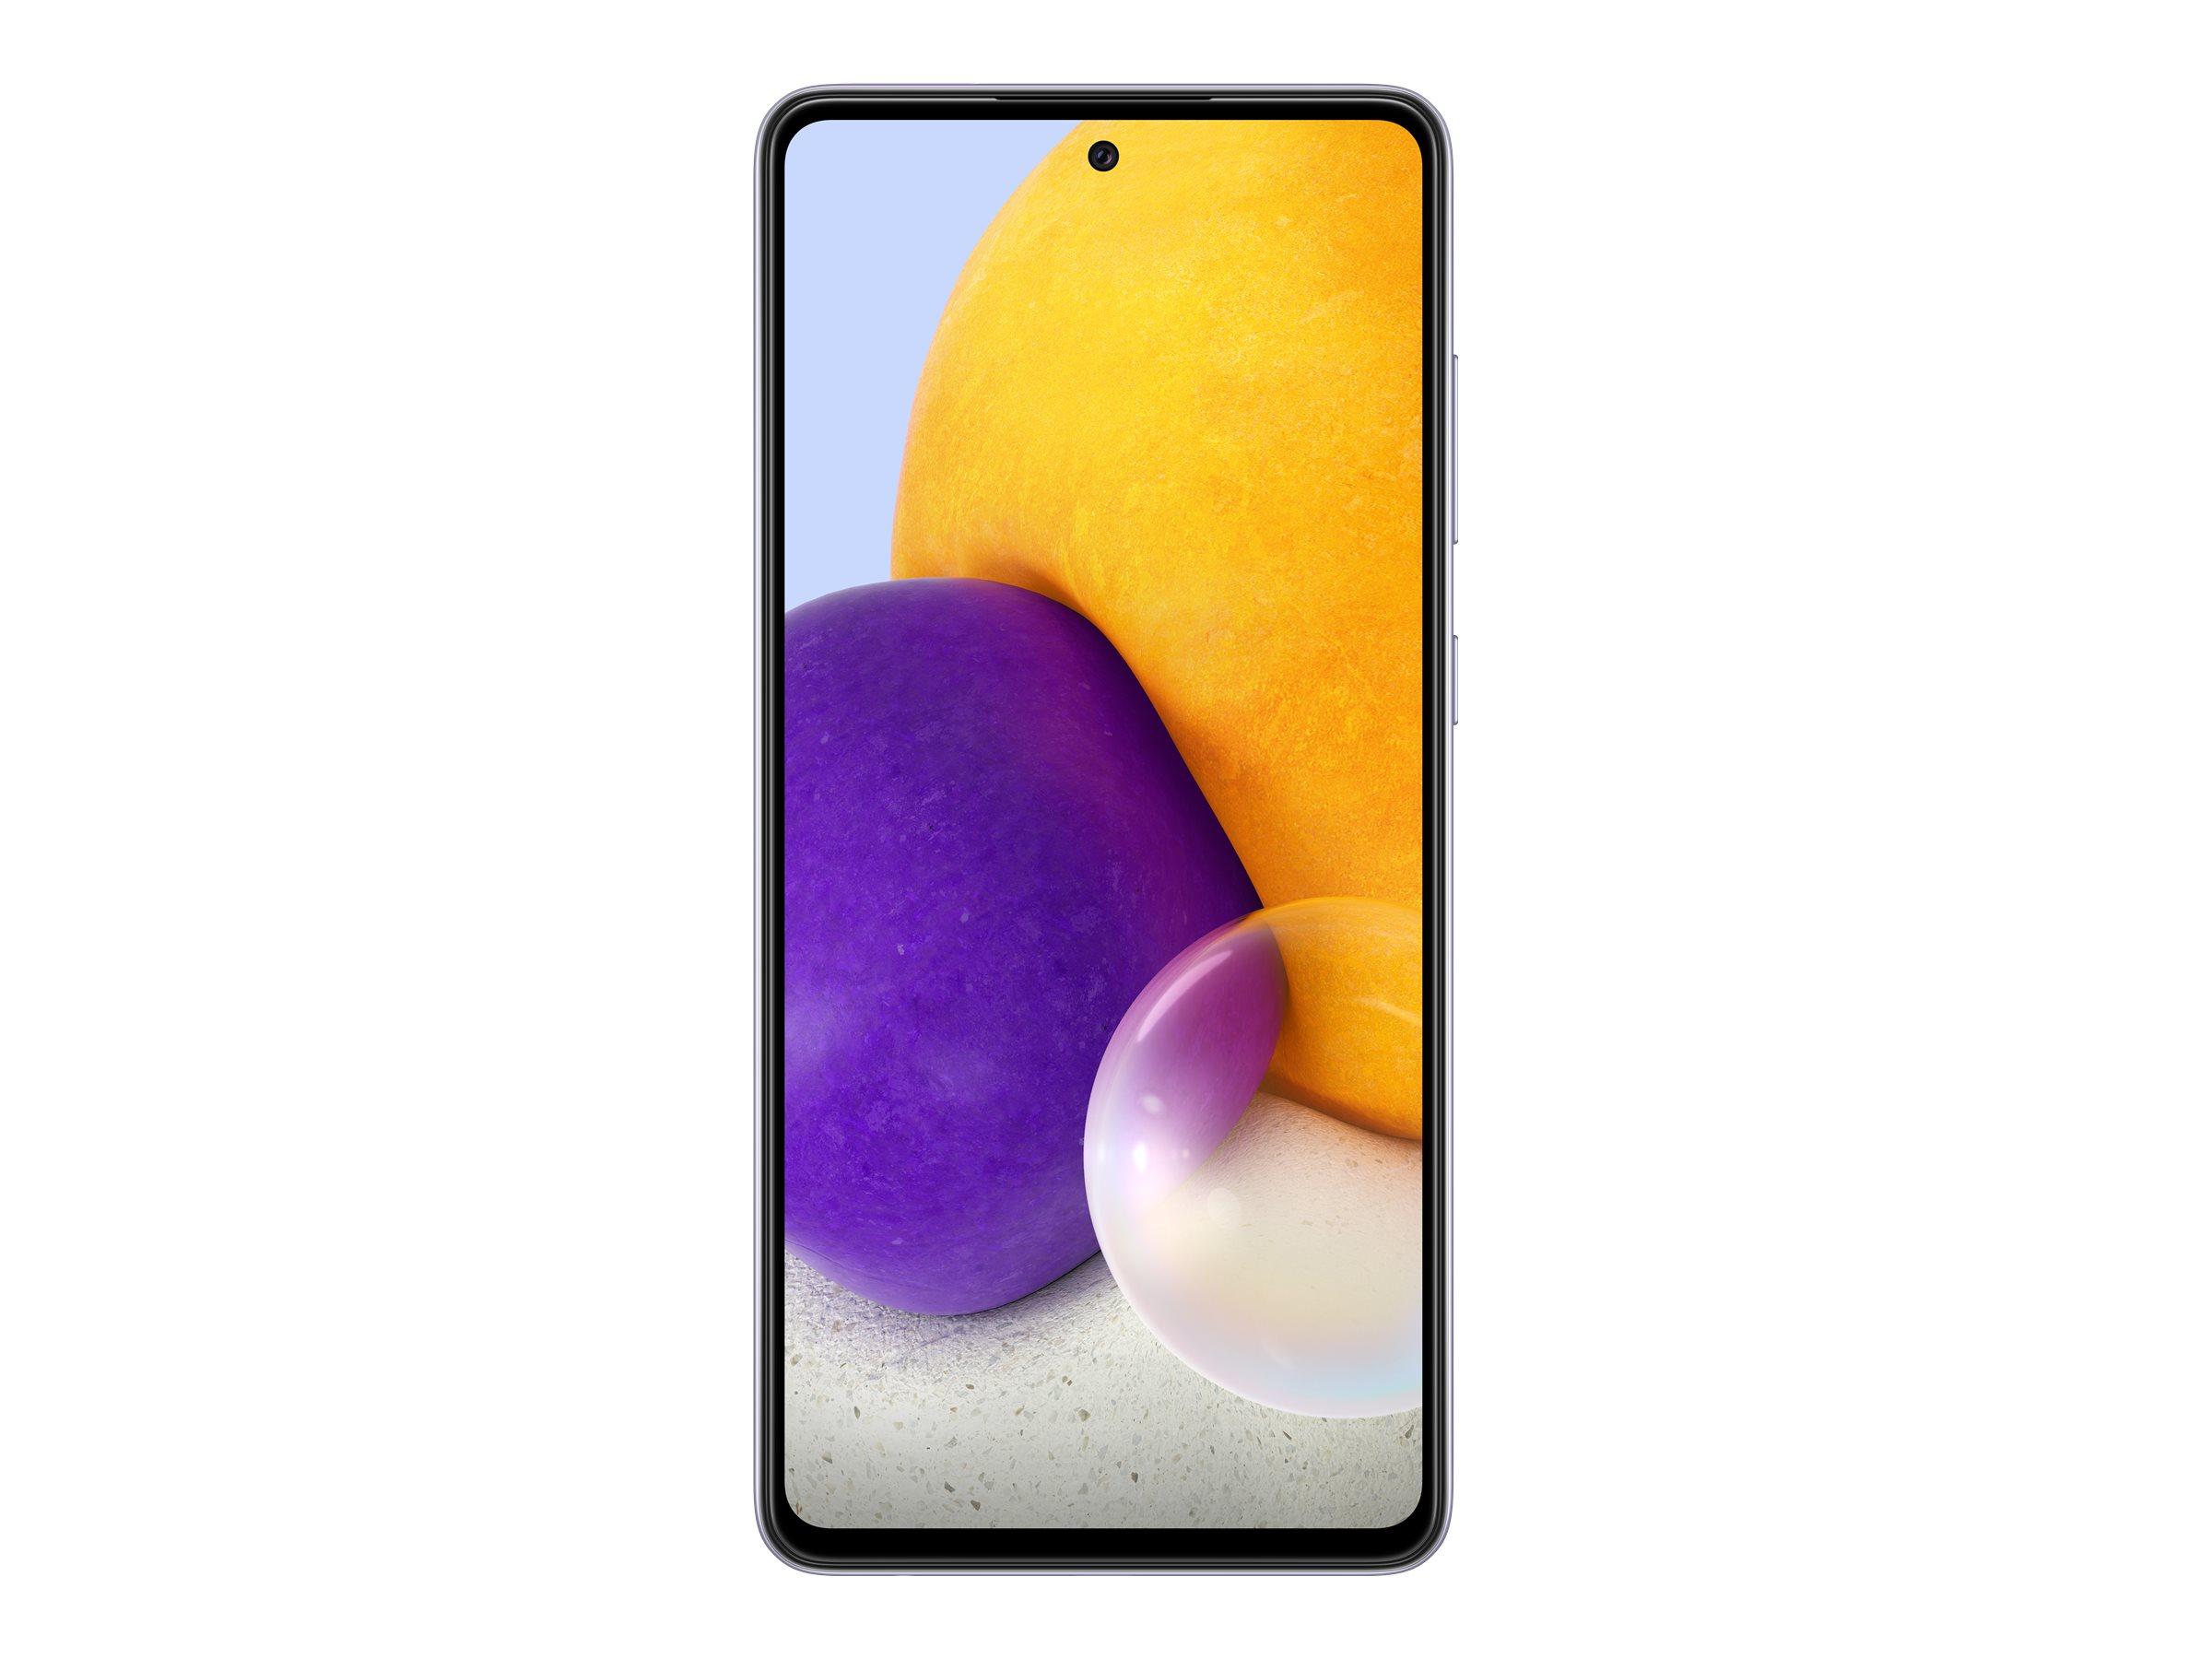 "Vorschau: Samsung Galaxy A72 - Smartphone - Dual-SIM - 4G LTE - 128 GB - microSD slot - 6.7"" - 2400 x 1080 Pixel - Super AMOLED - RAM 6 GB (32 MP Vorderkamera)"